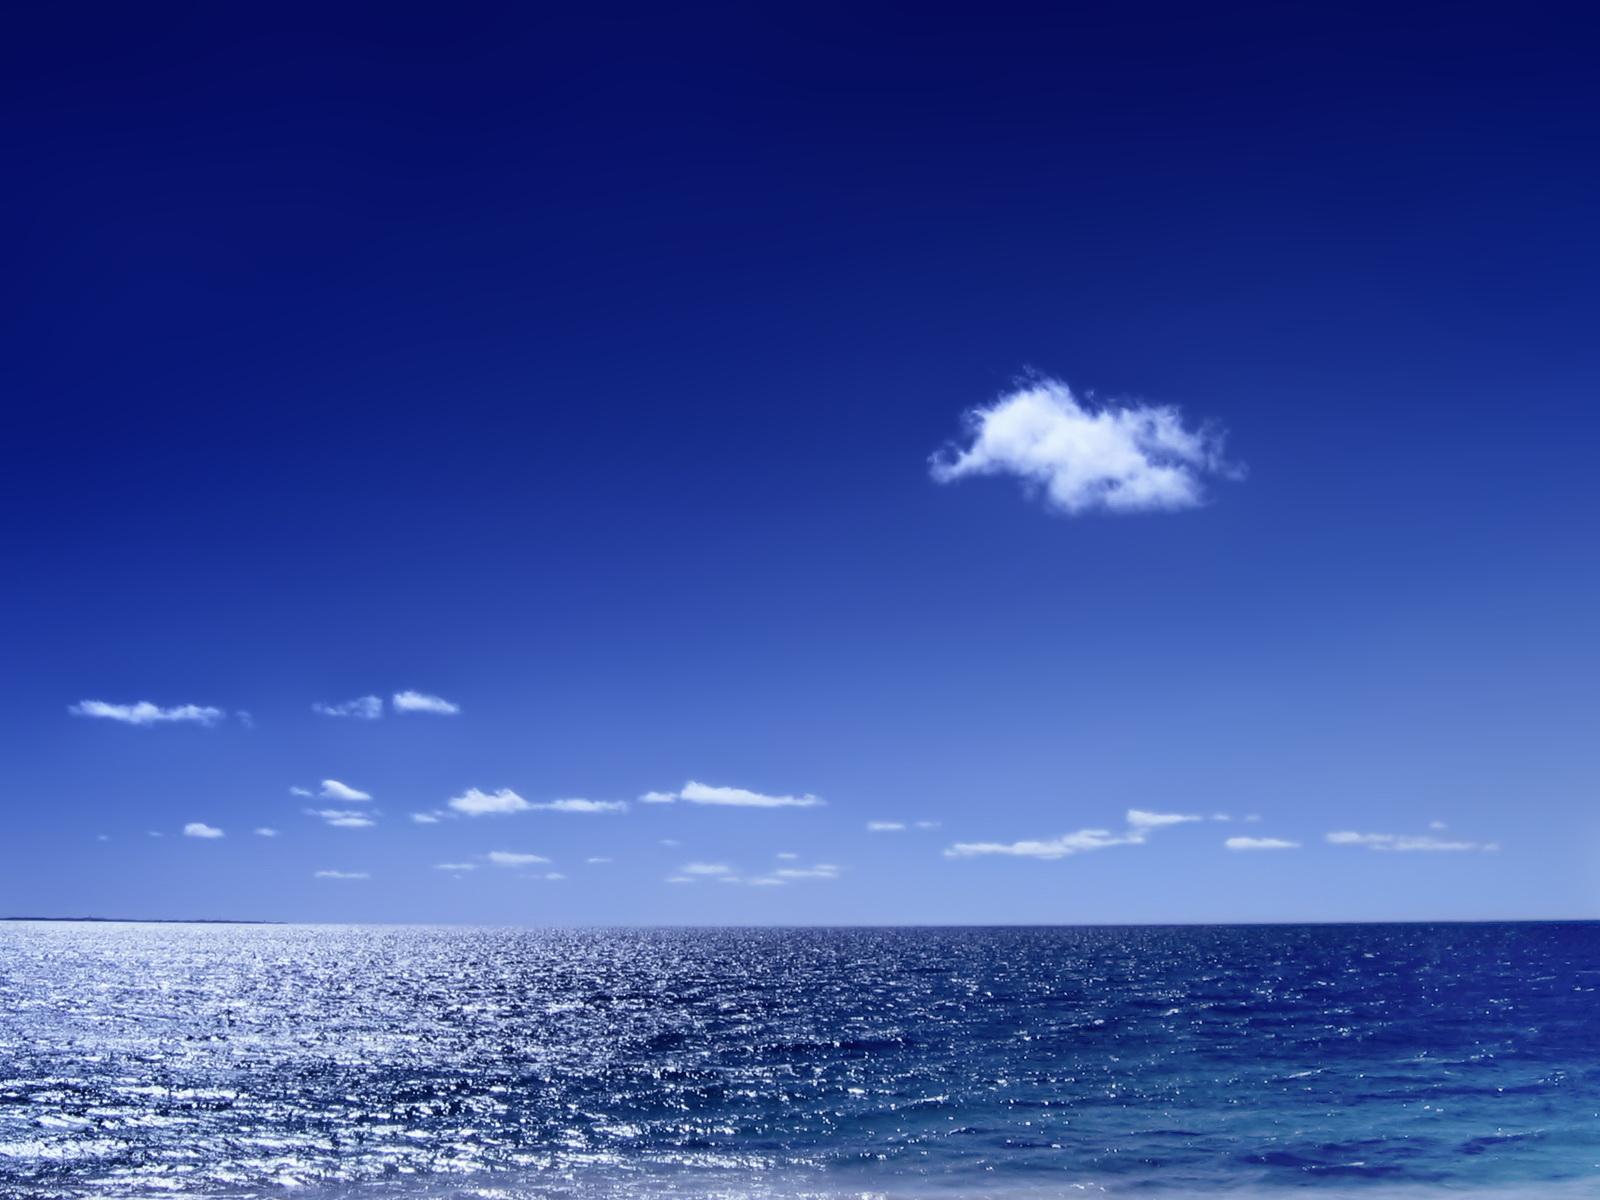 http://3.bp.blogspot.com/-LbYMGXpYhXI/TwRo8qyW9II/AAAAAAAAAnA/i7QbST2vcBM/s1600/the-blue-ocean-wallpapers_8761_1600x1200.jpg